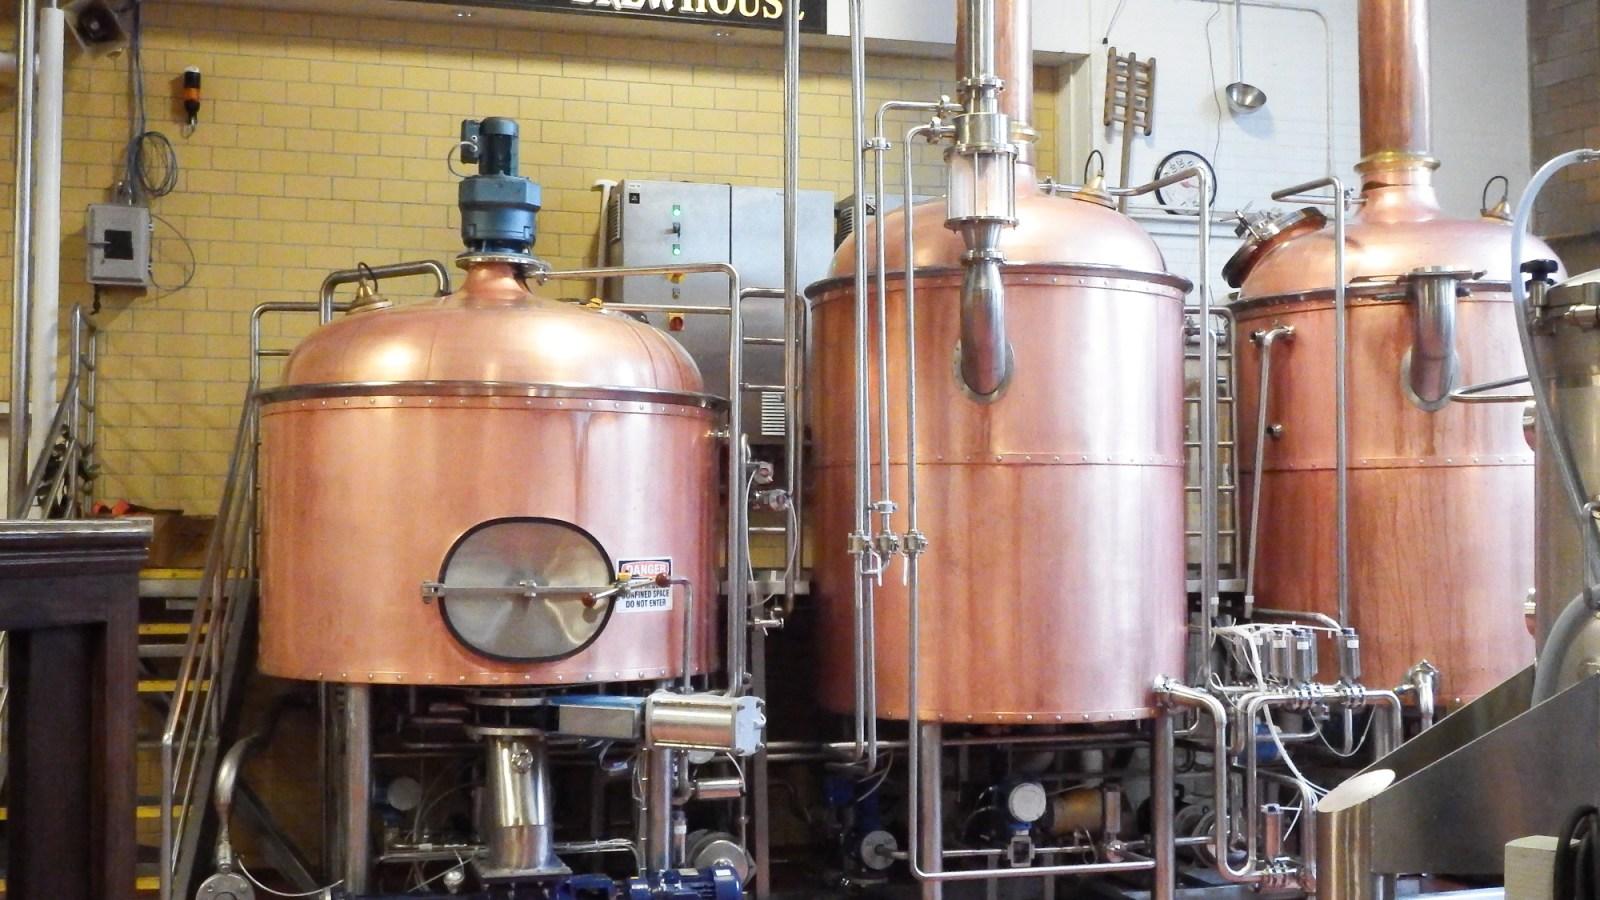 Sam Adams Brewery Tour, Boston, Massachusetts